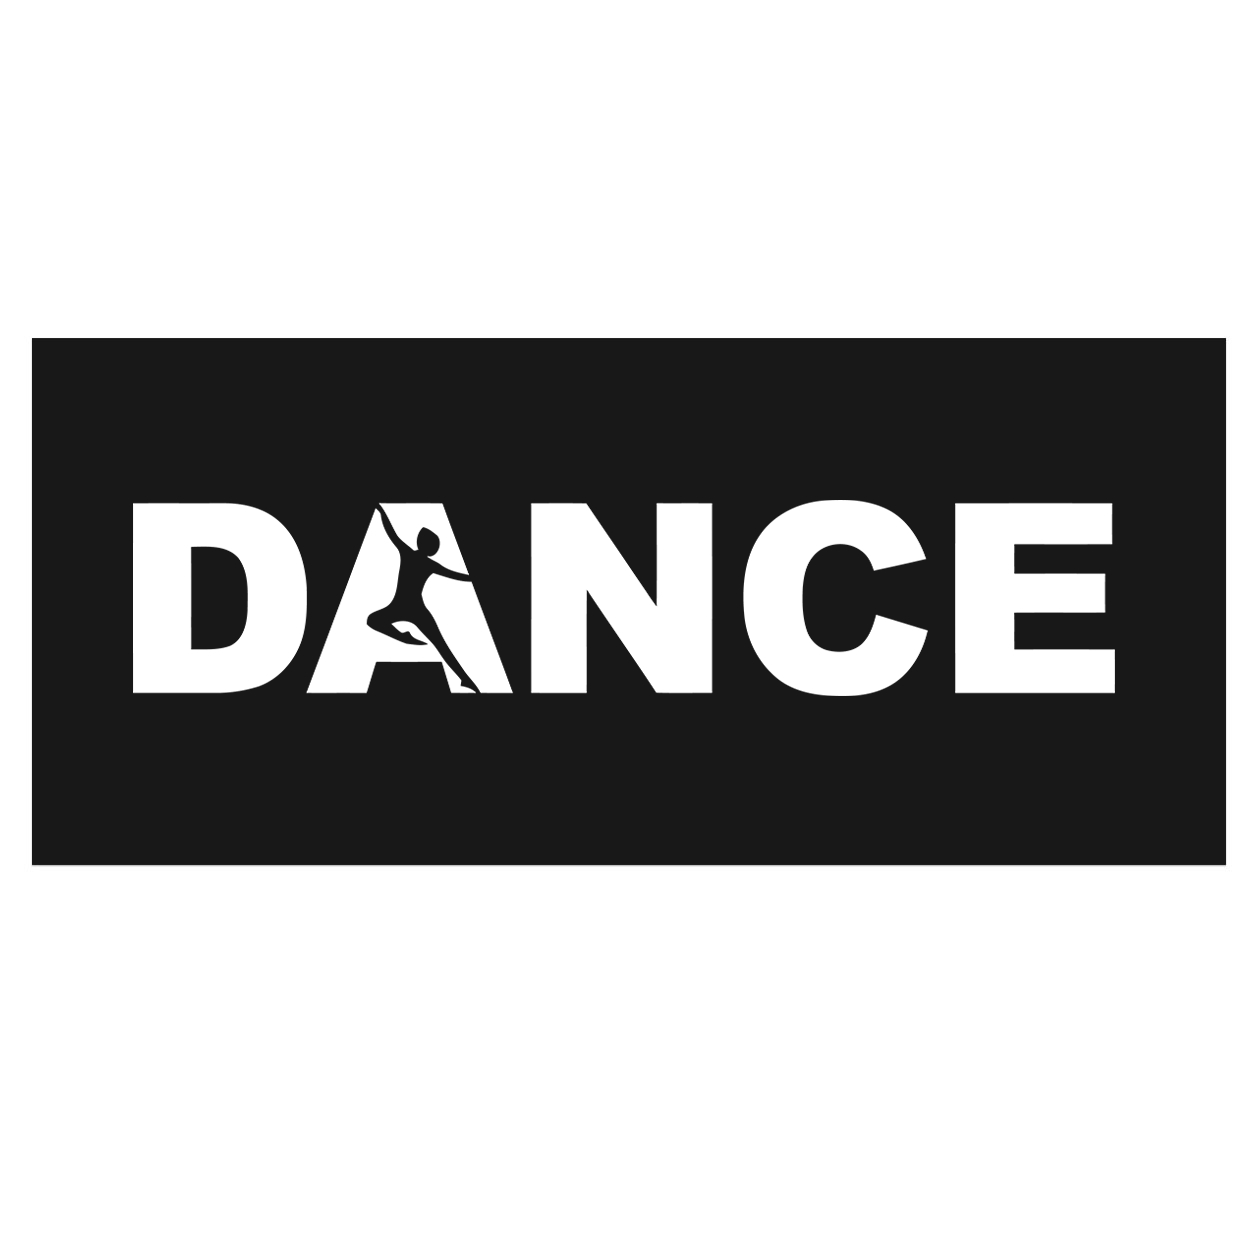 Dance Silhouette Logo Classic Hardboard Sign (White Logo)